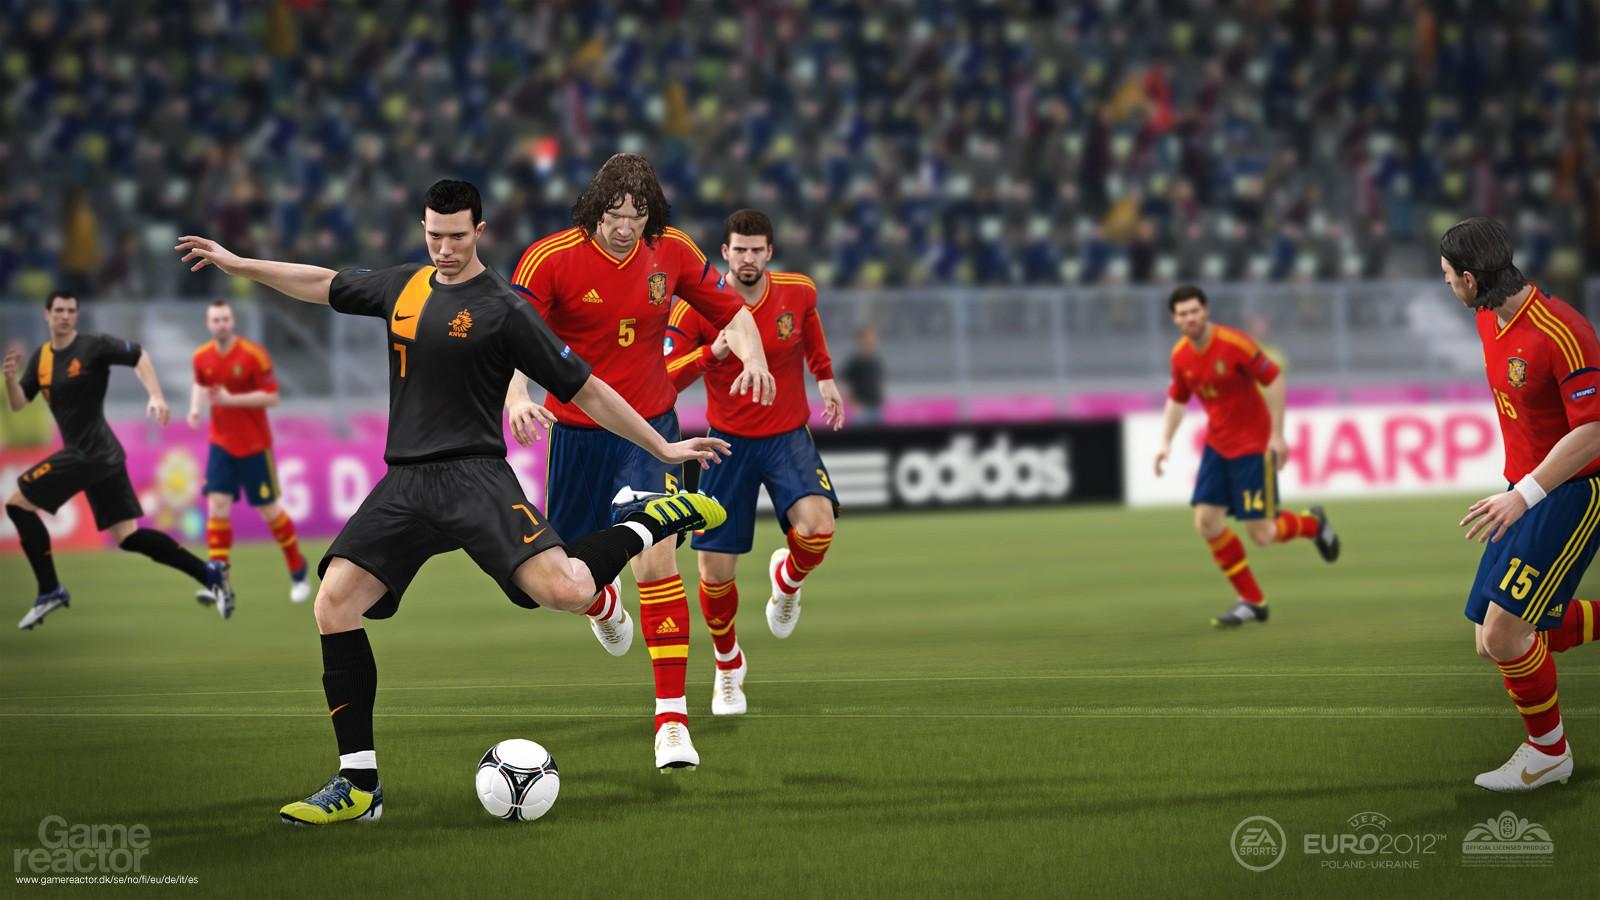 Uefa euro 2012 (video game) wikipedia.